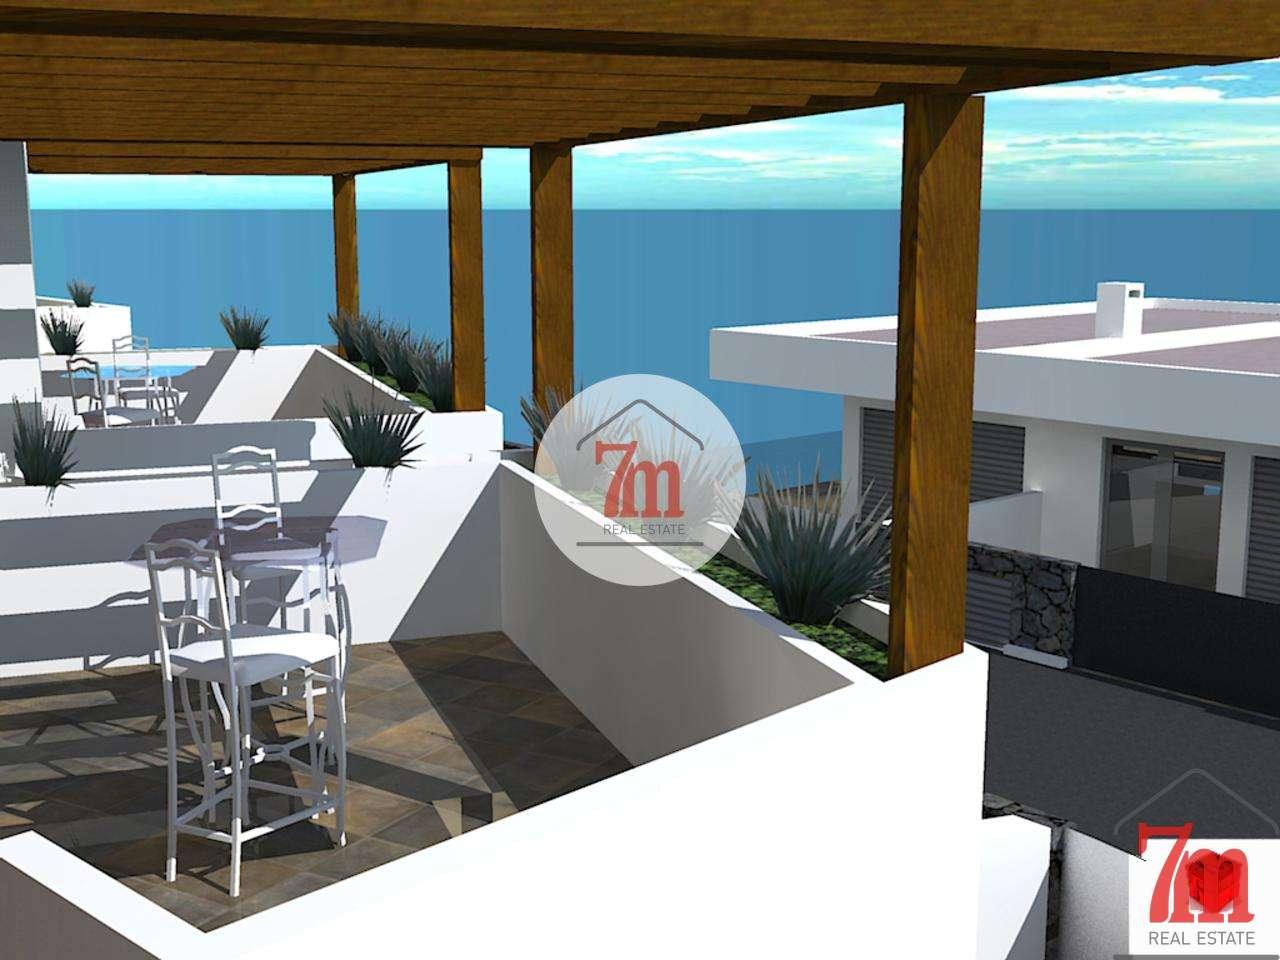 Terreno para comprar, Santa Maria Maior, Ilha da Madeira - Foto 7